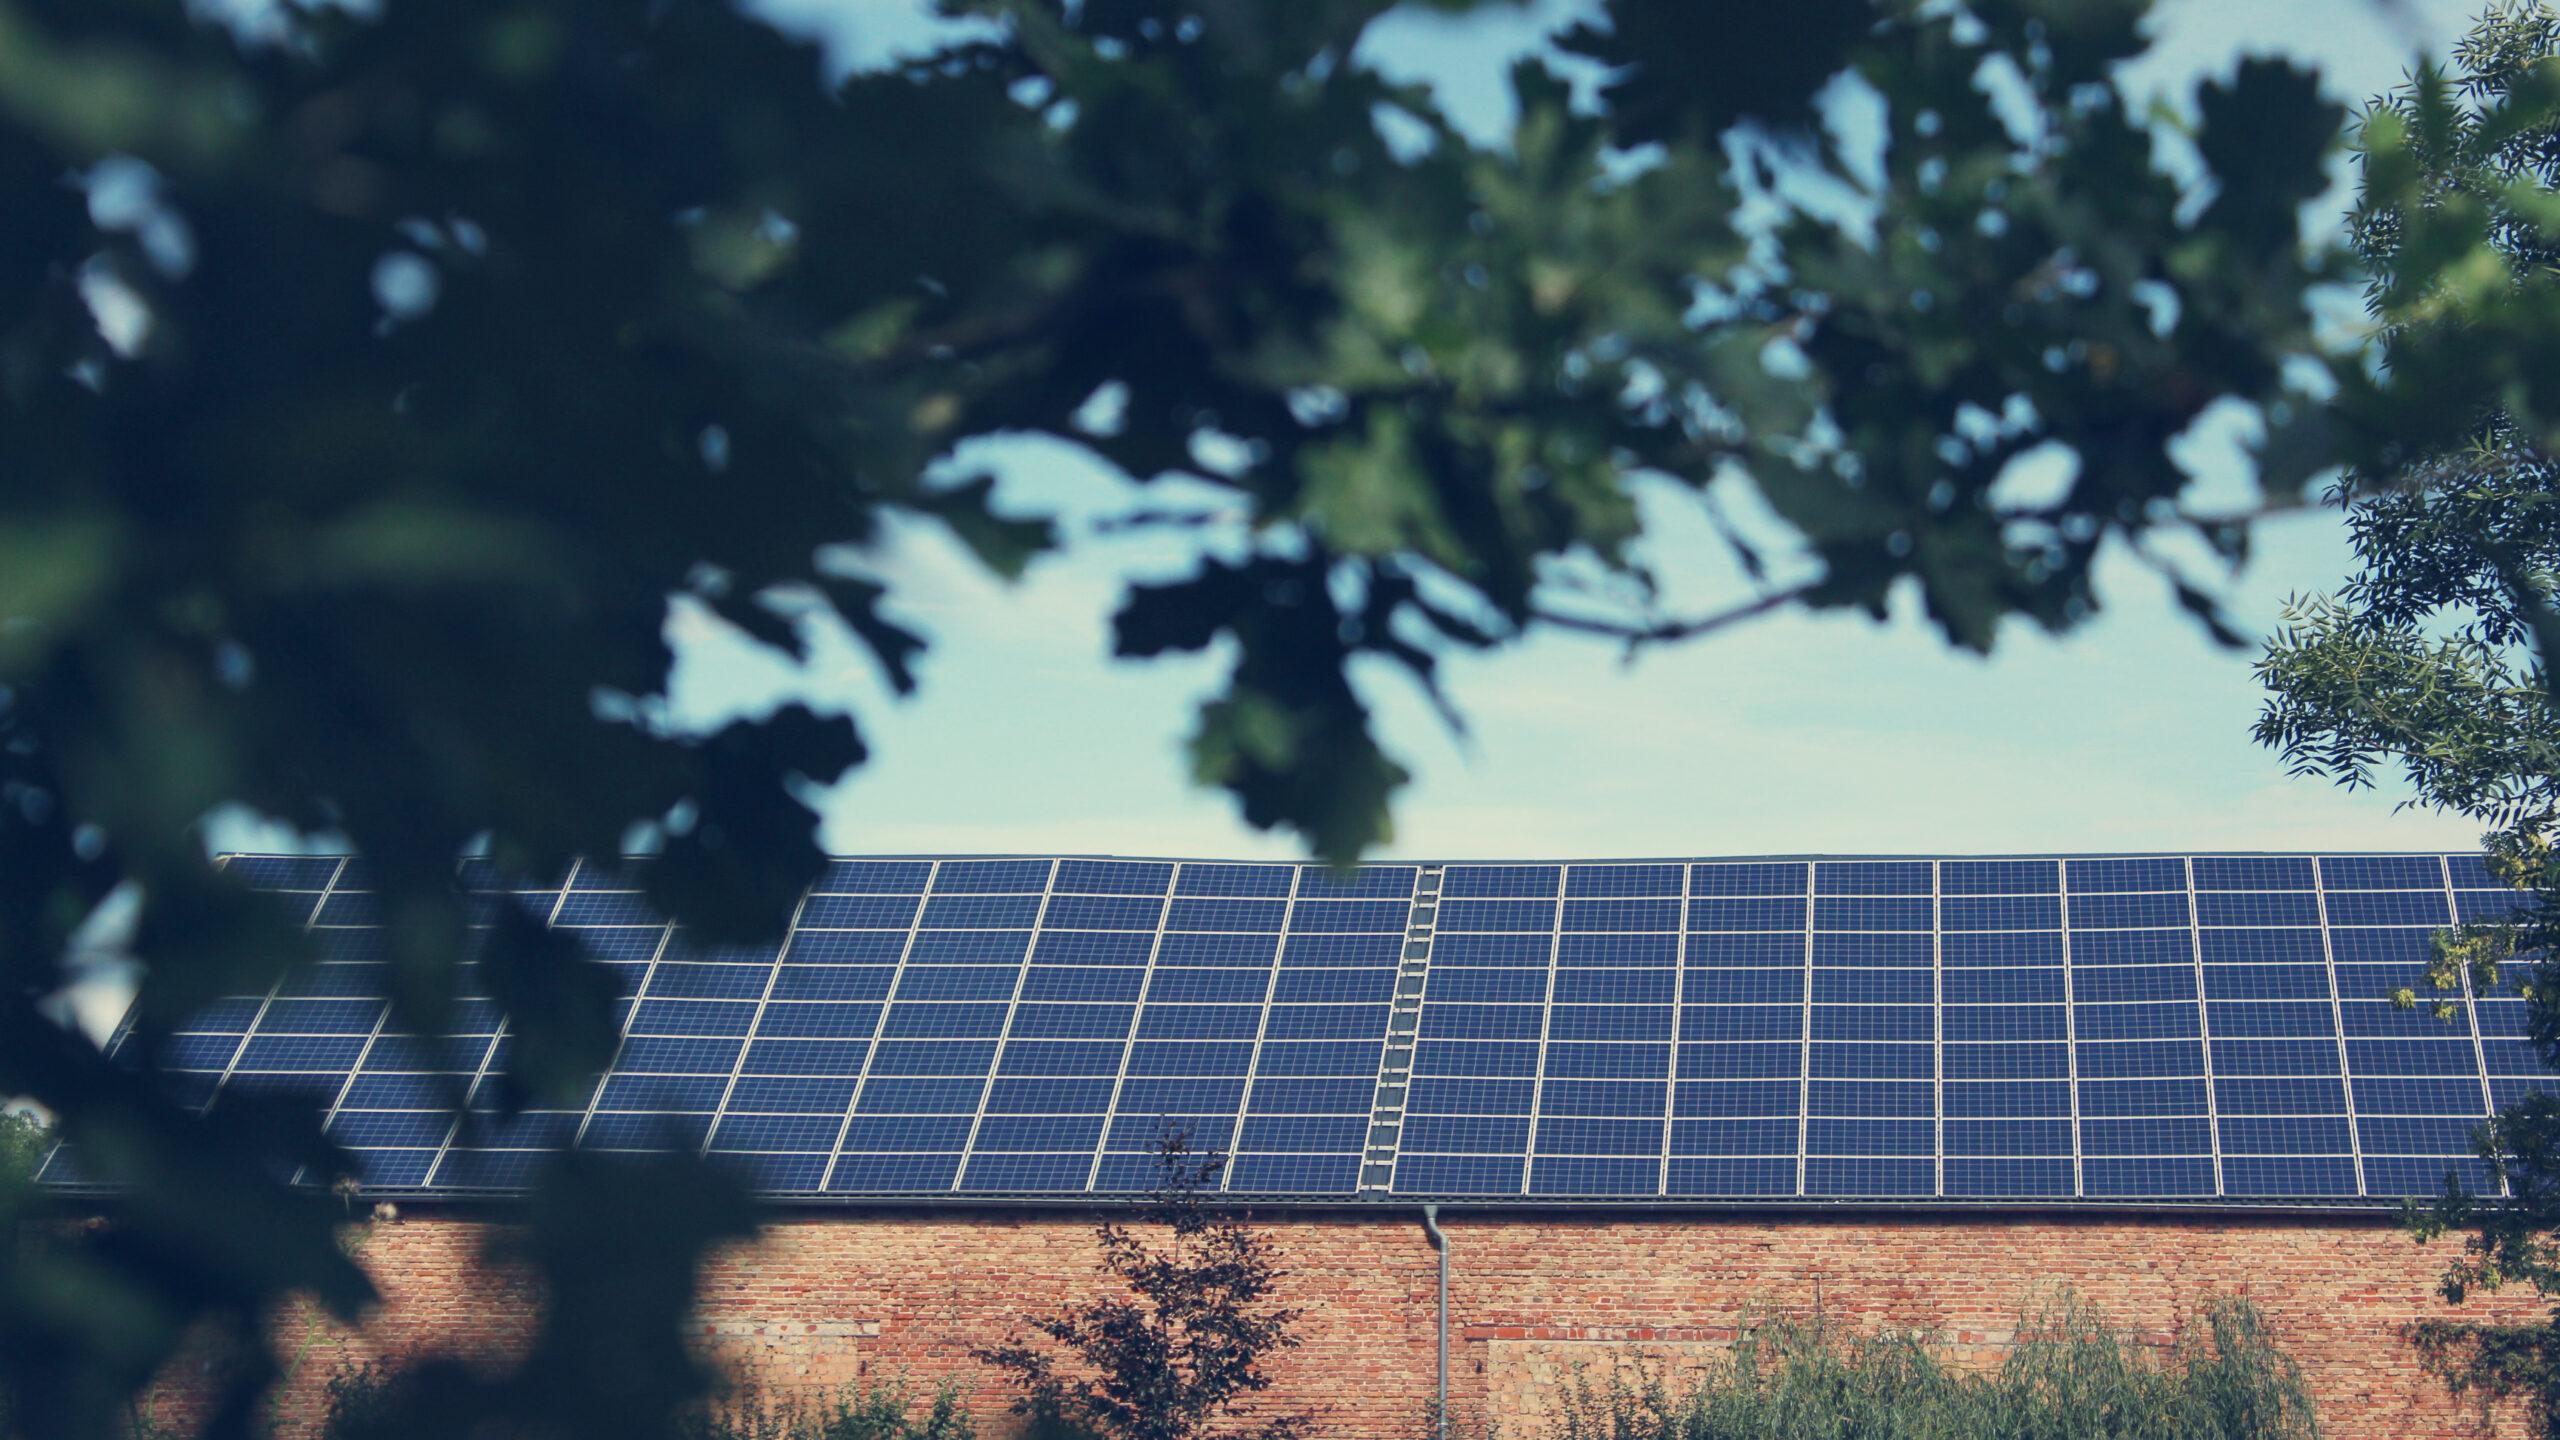 Scheune Solar